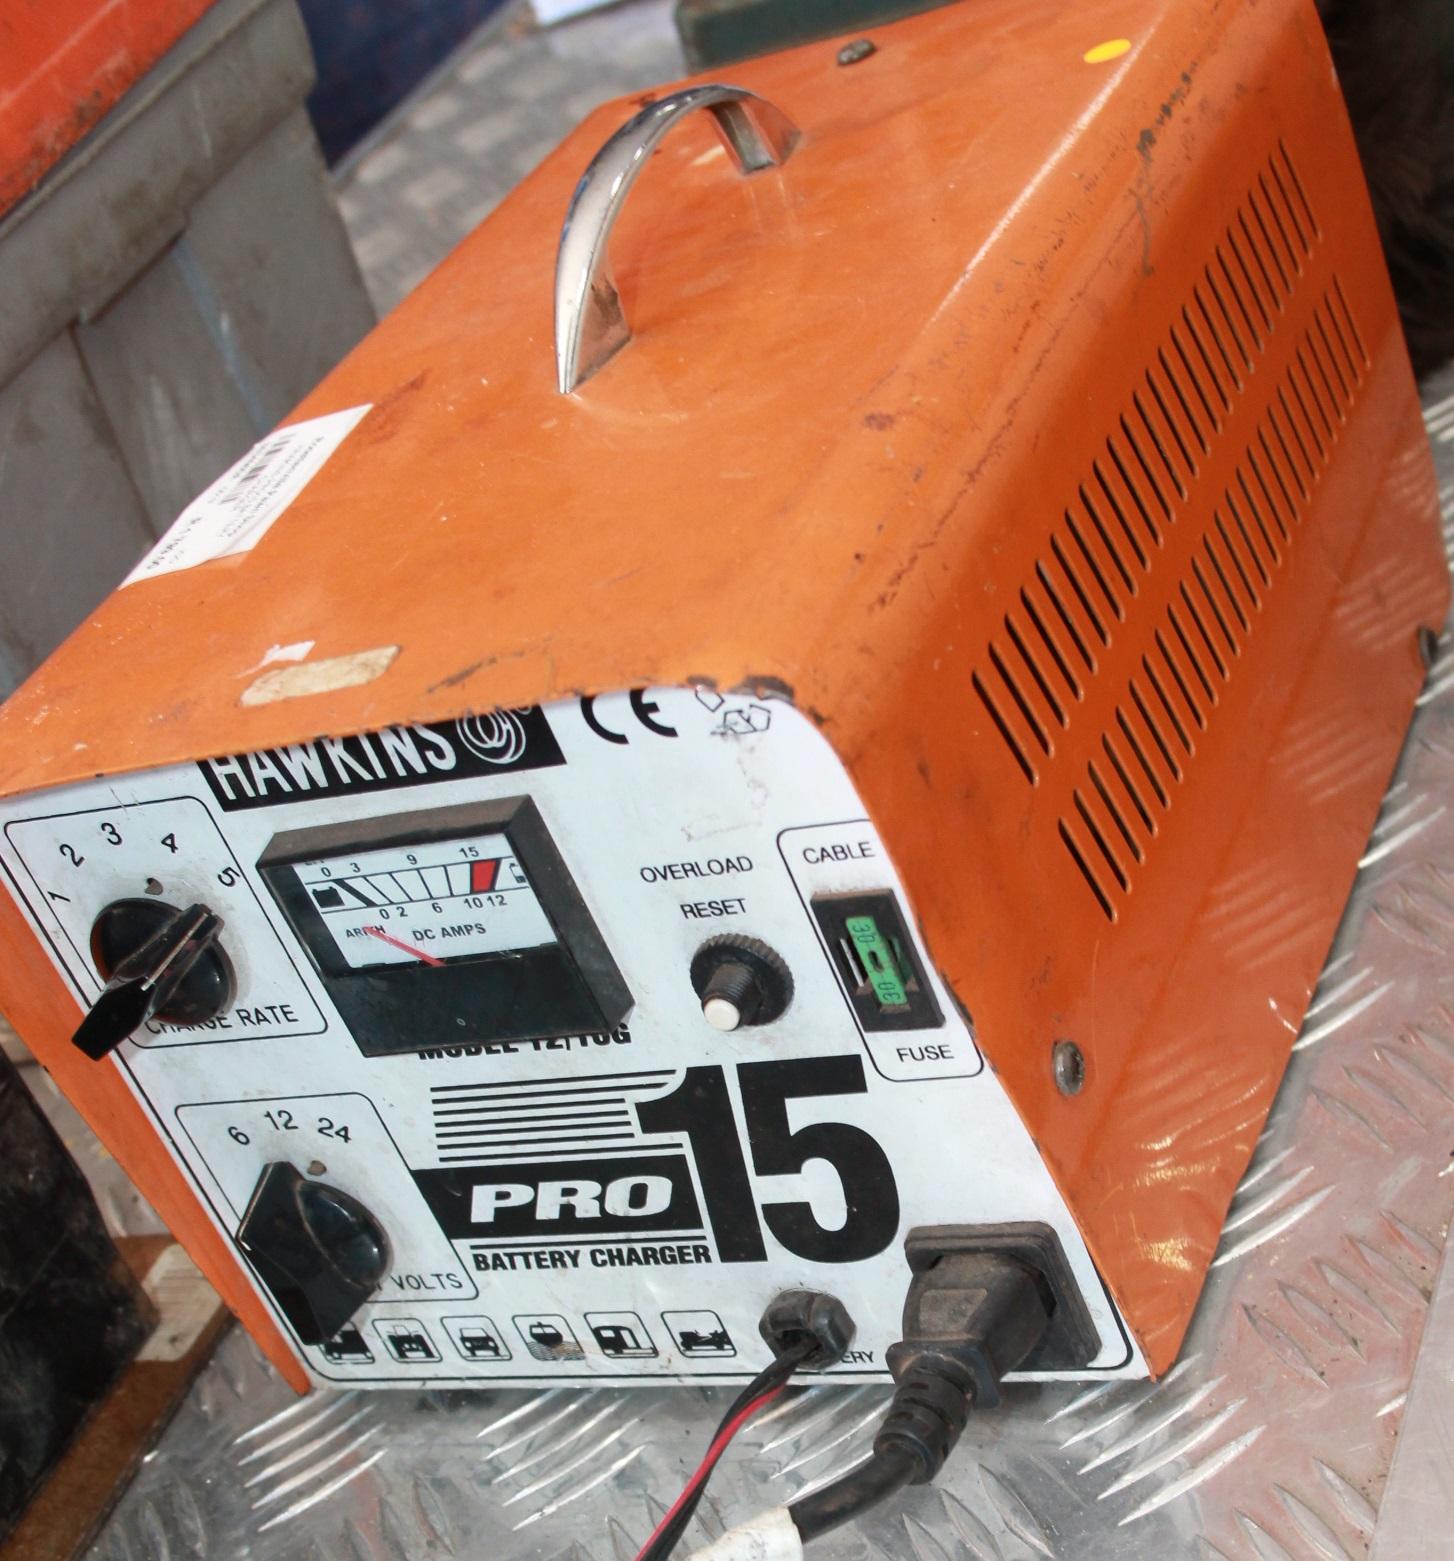 S034960A Hawkins proi5 battery charger #Rosettenvillepawnshop